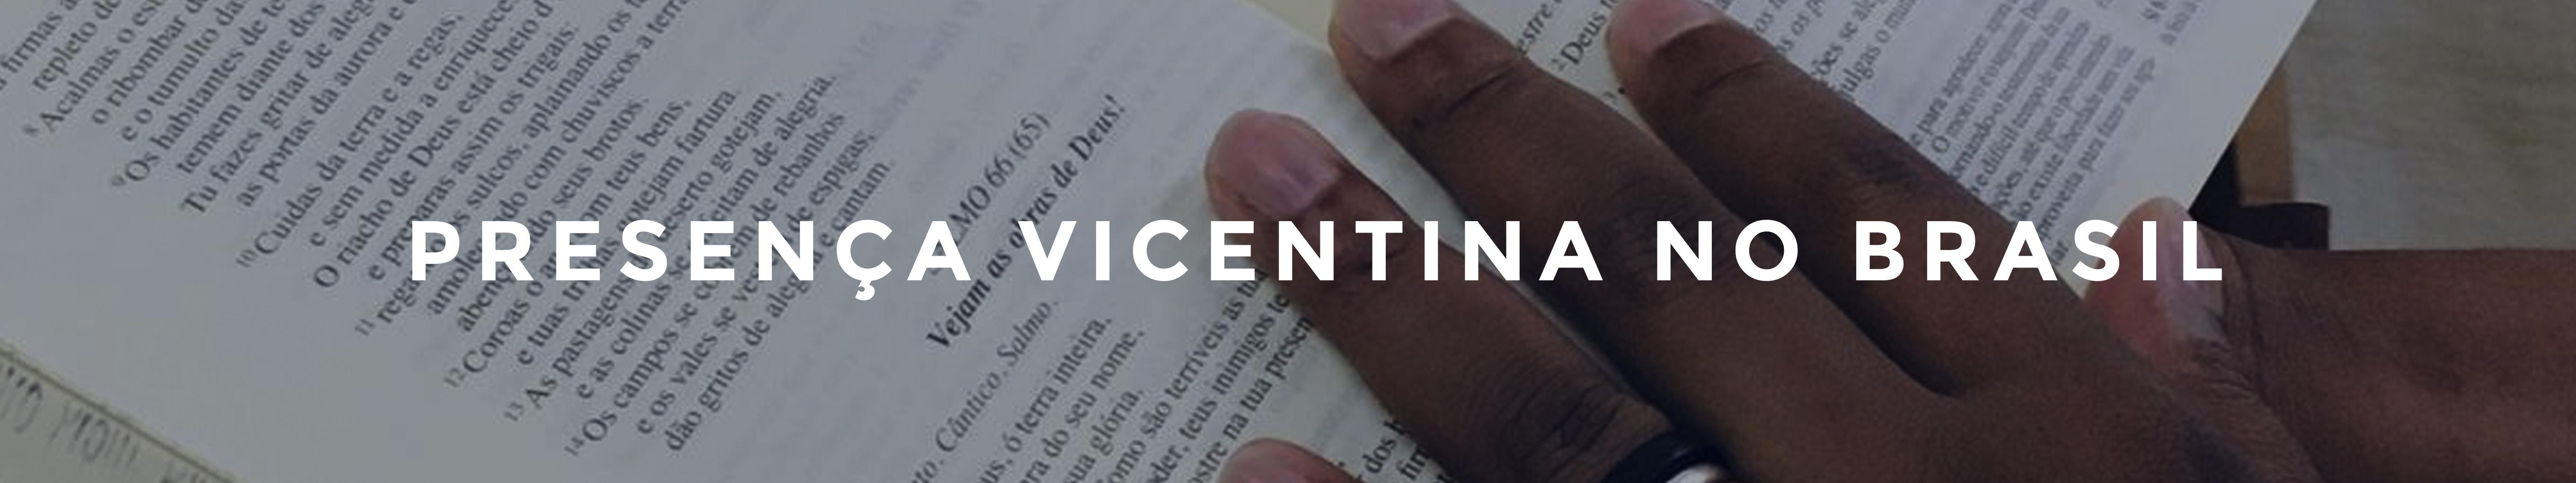 Presença Vicentina no Brasil